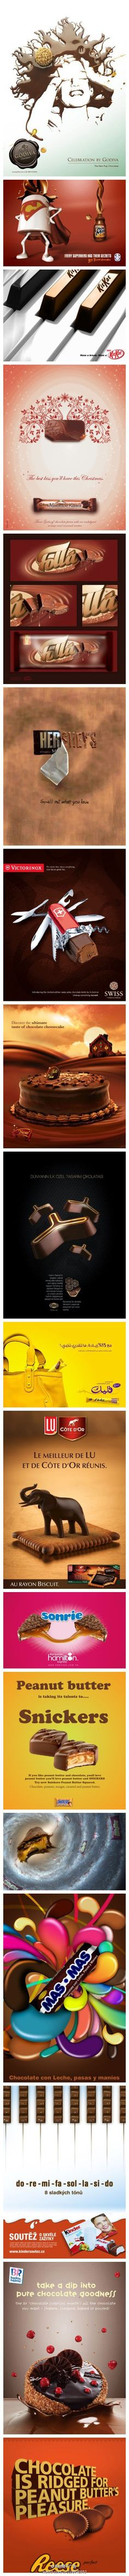 Chocolate ads